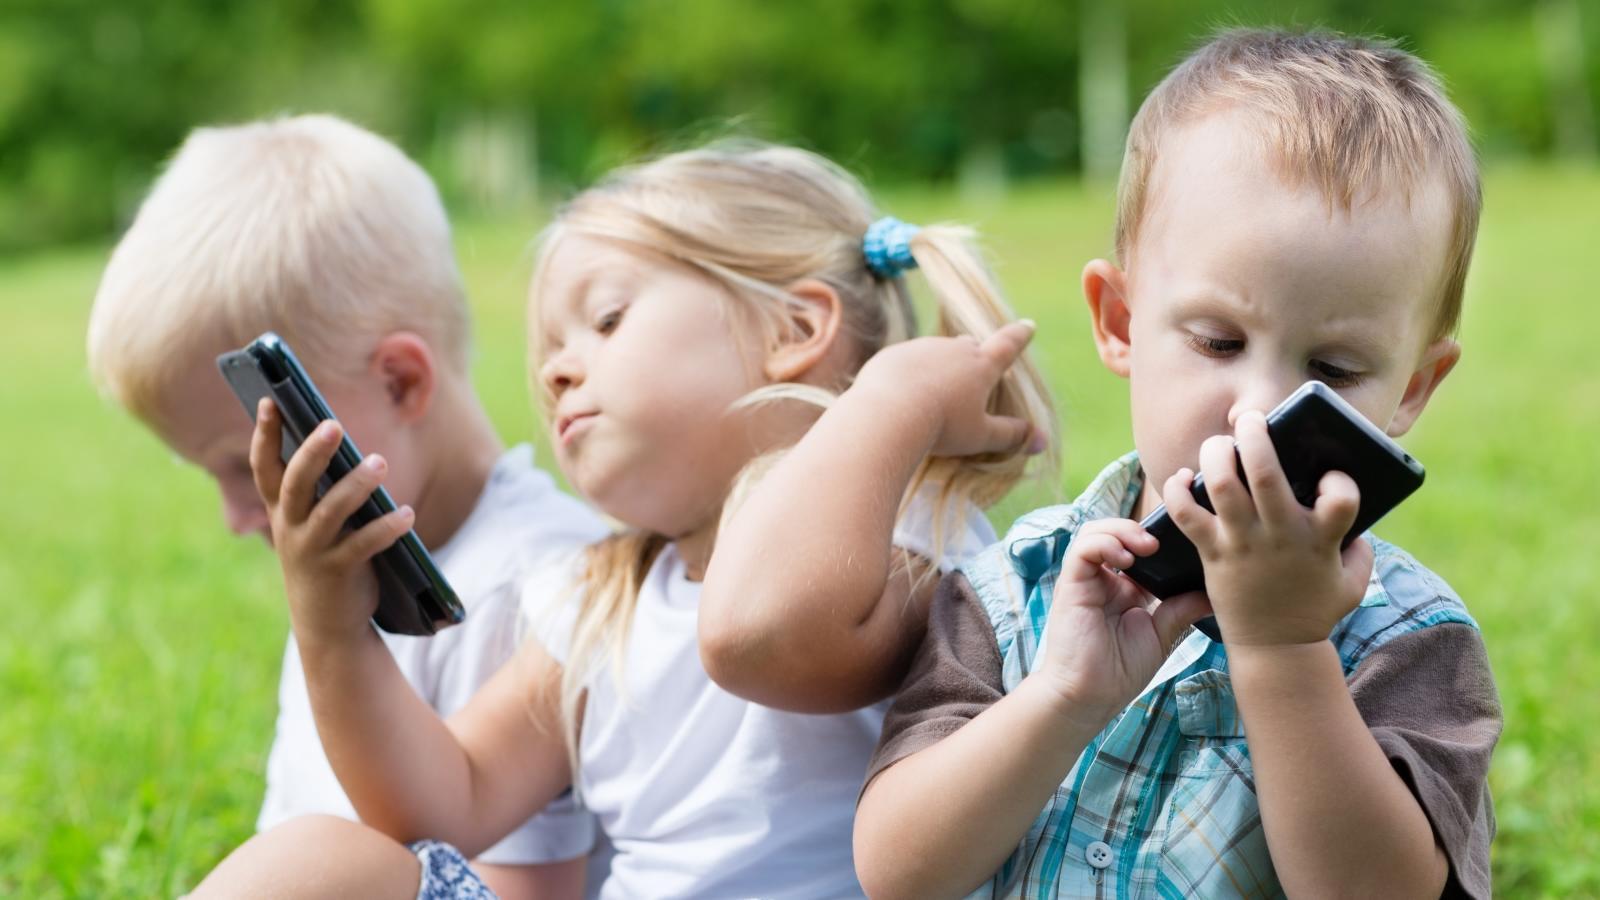 Dad Bans Smartphones For Children